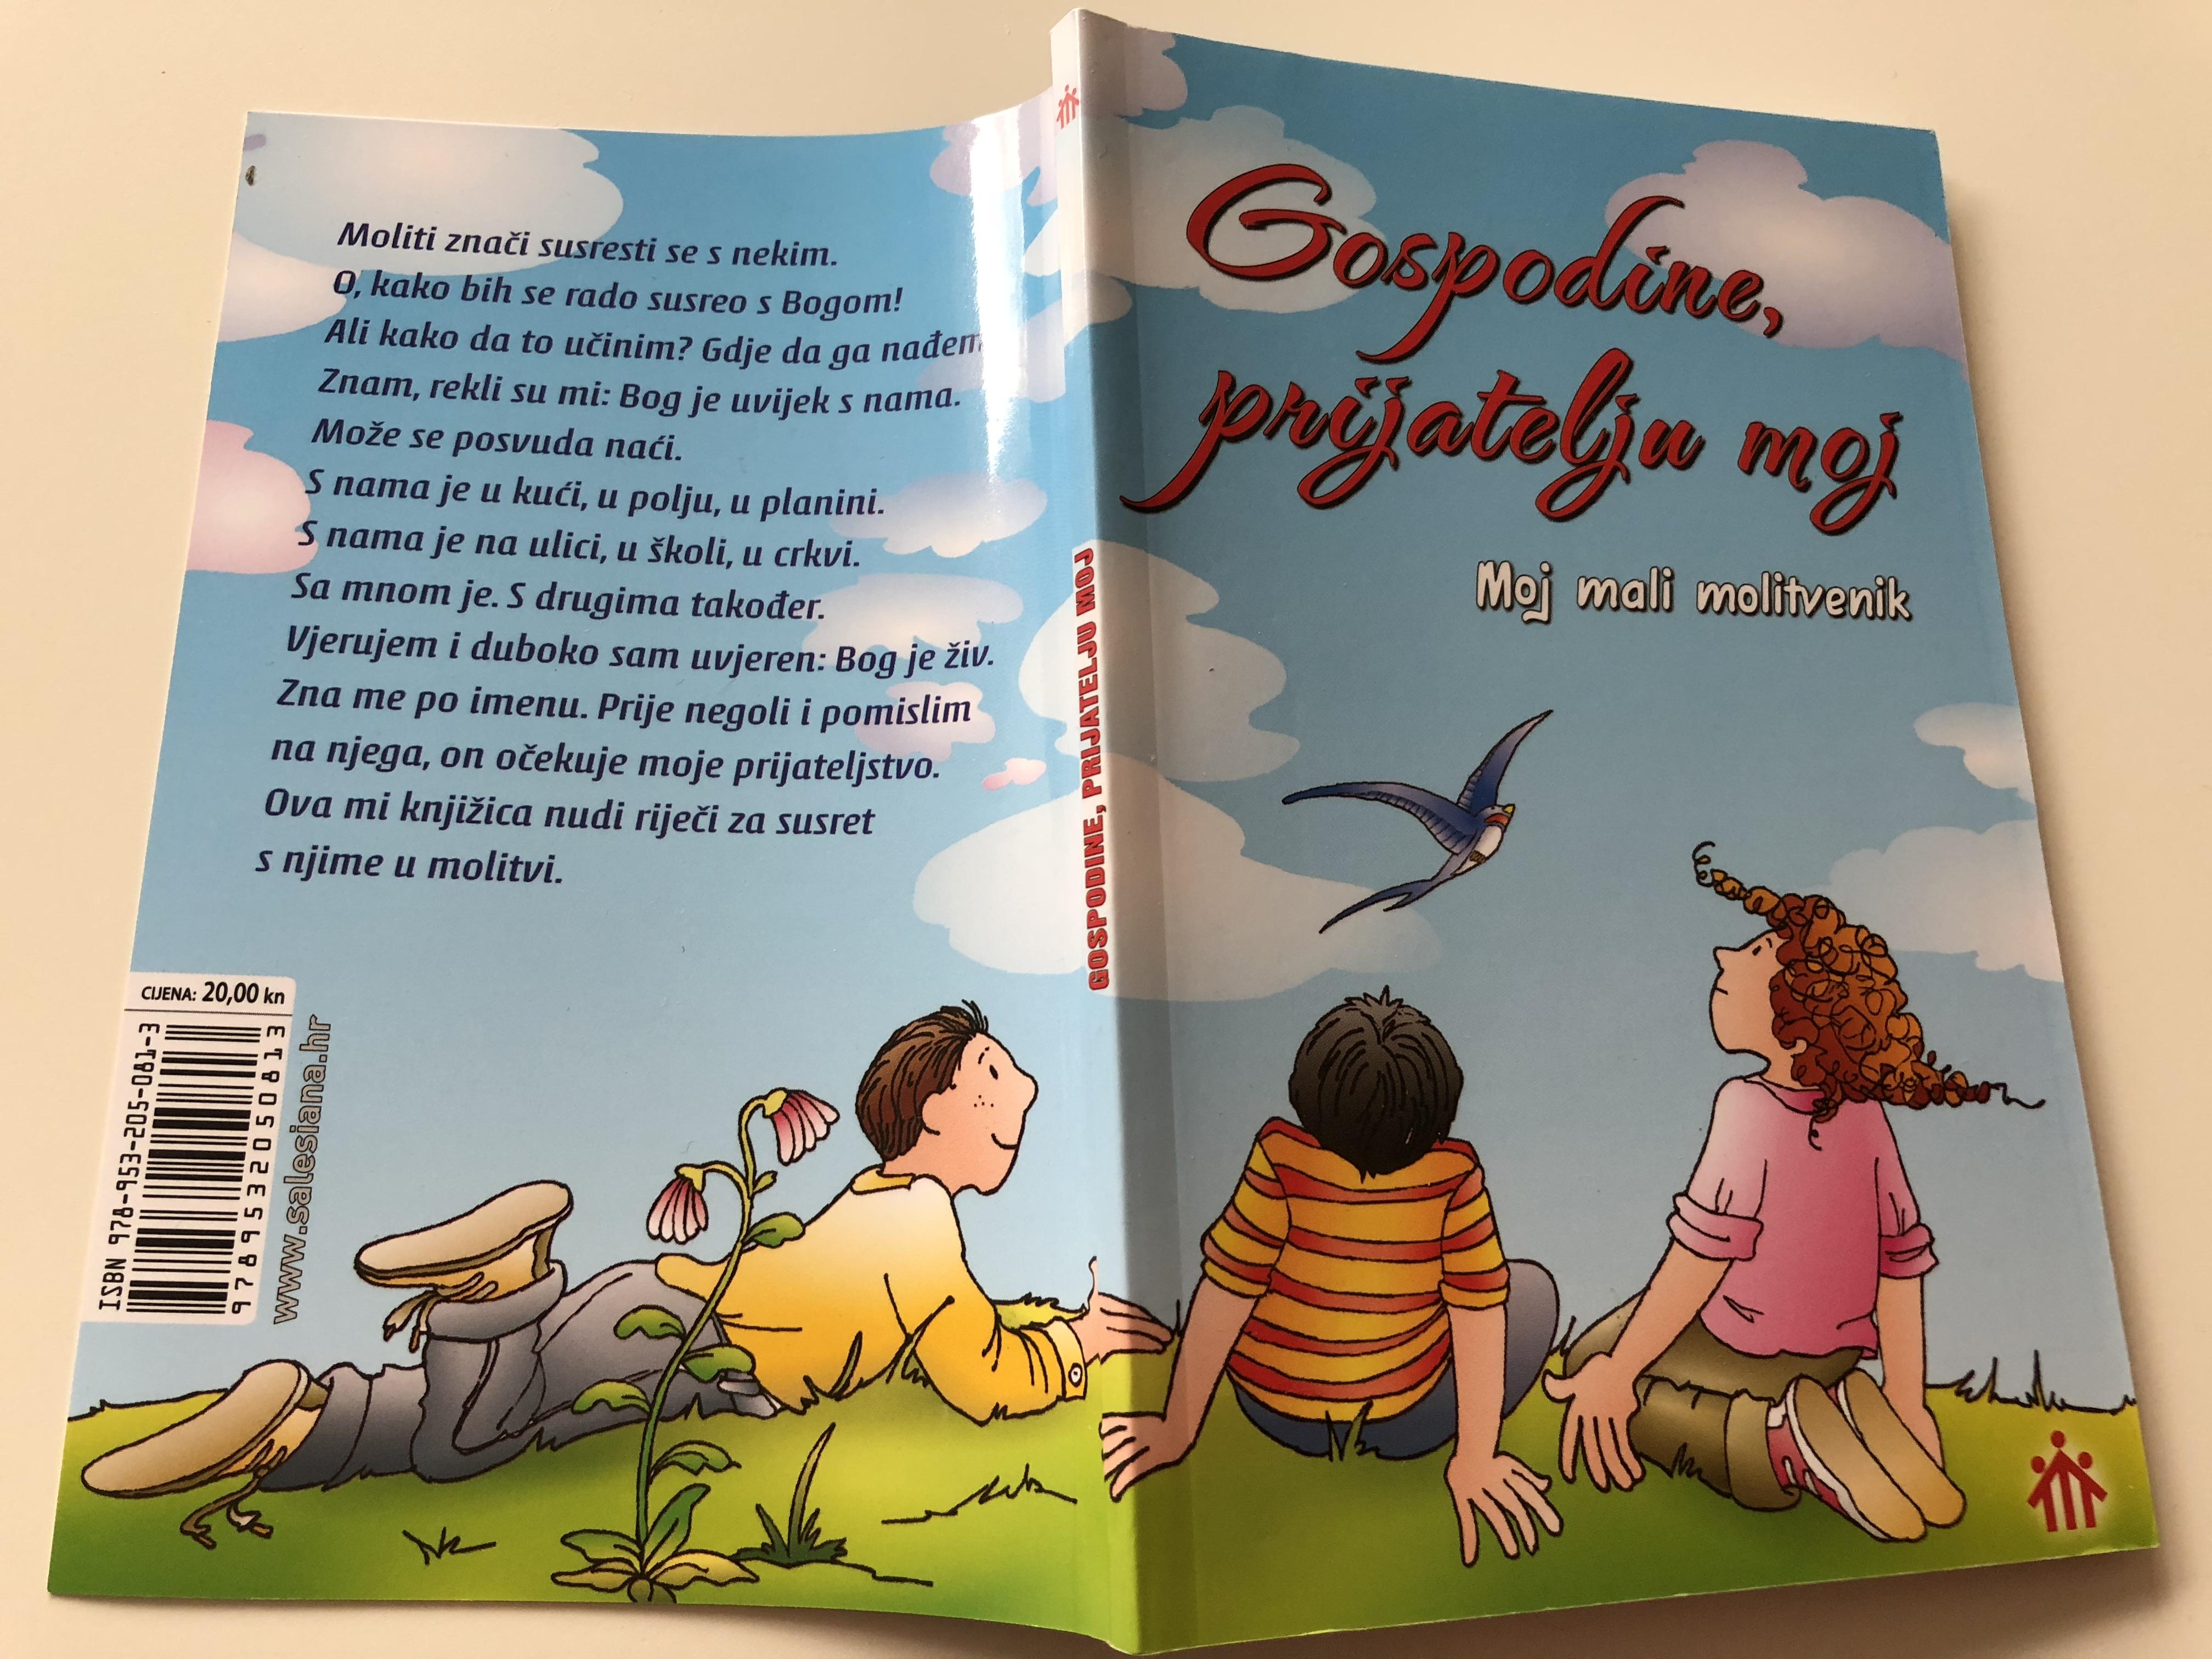 gospodine-prijatelju-moj-lord-my-friend-my-little-prayerbook-croatian-language-edition-of-signore-amico-mio-12-.jpg